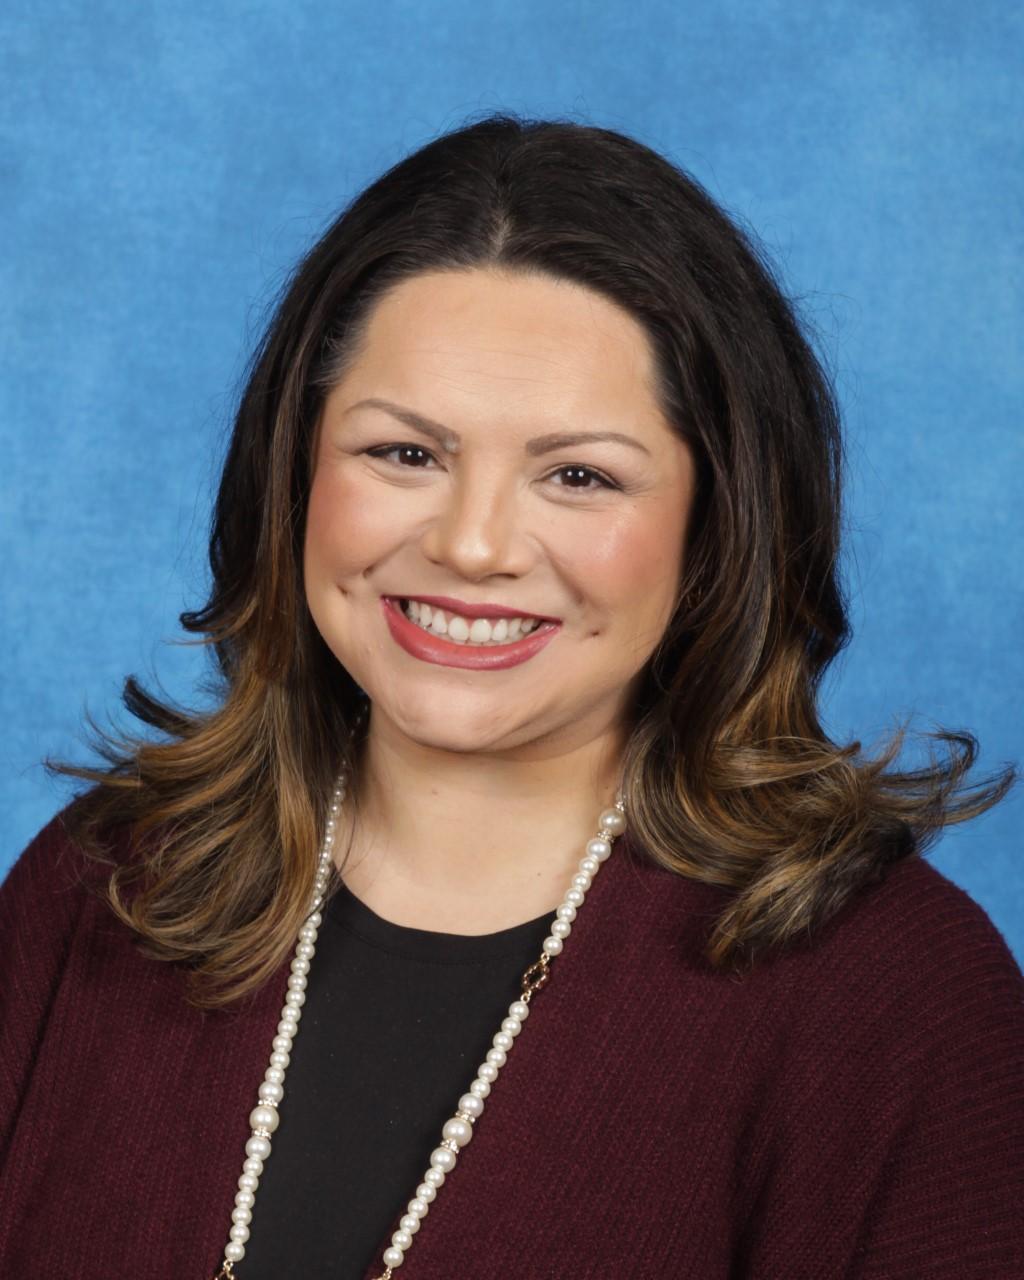 Dr. Sonya Kiefer